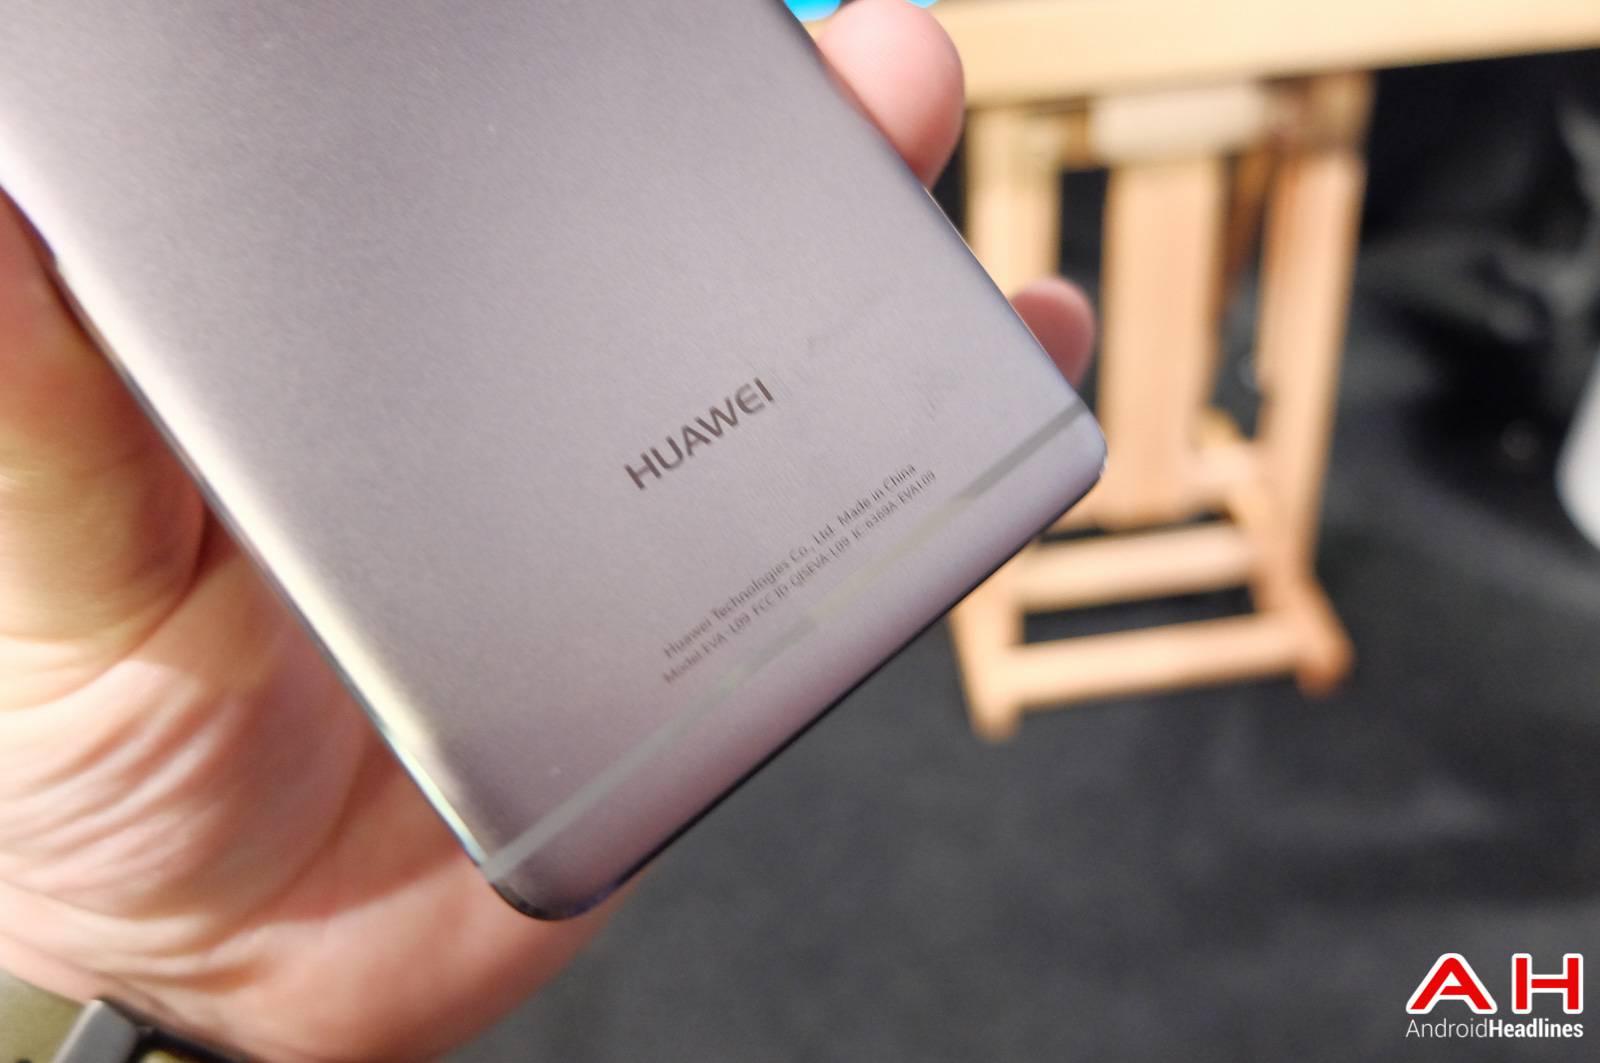 Huawei P9 Plus AH 0526